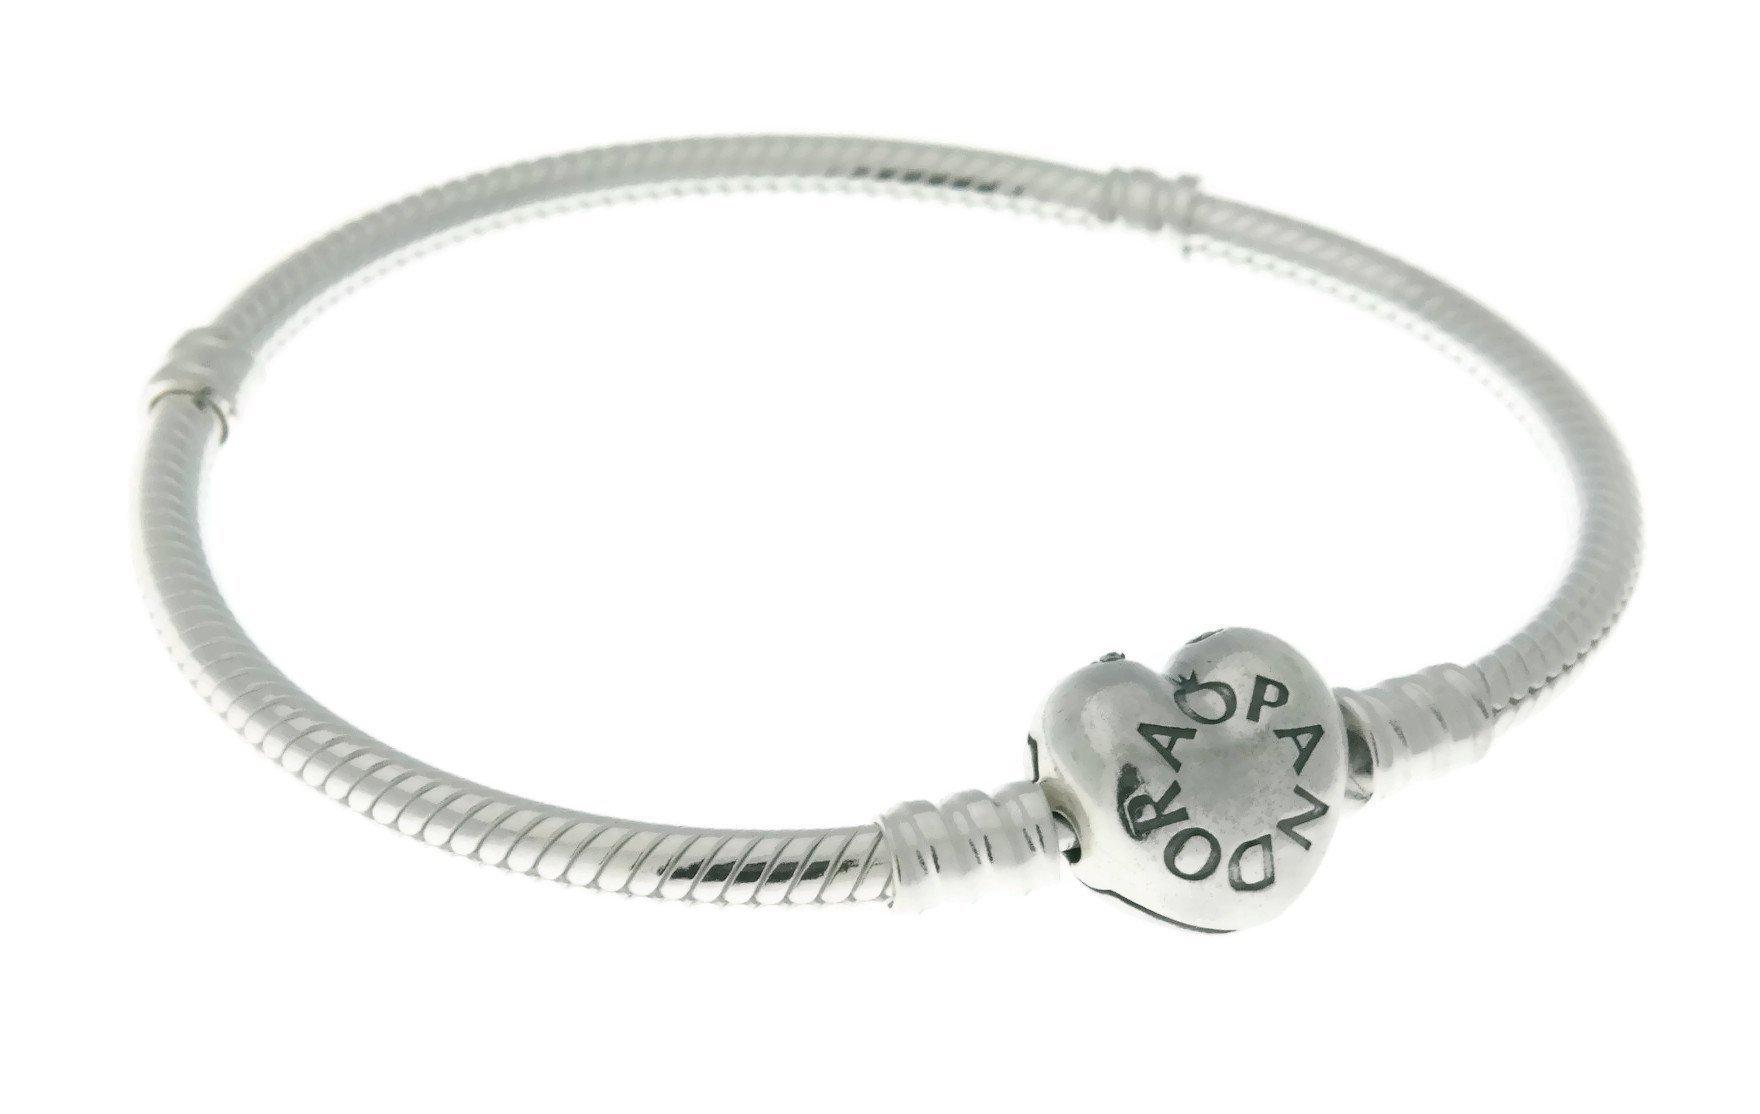 Pandora Women's Silver Bracelet with Heart Clasp 7.1'' 590719-18